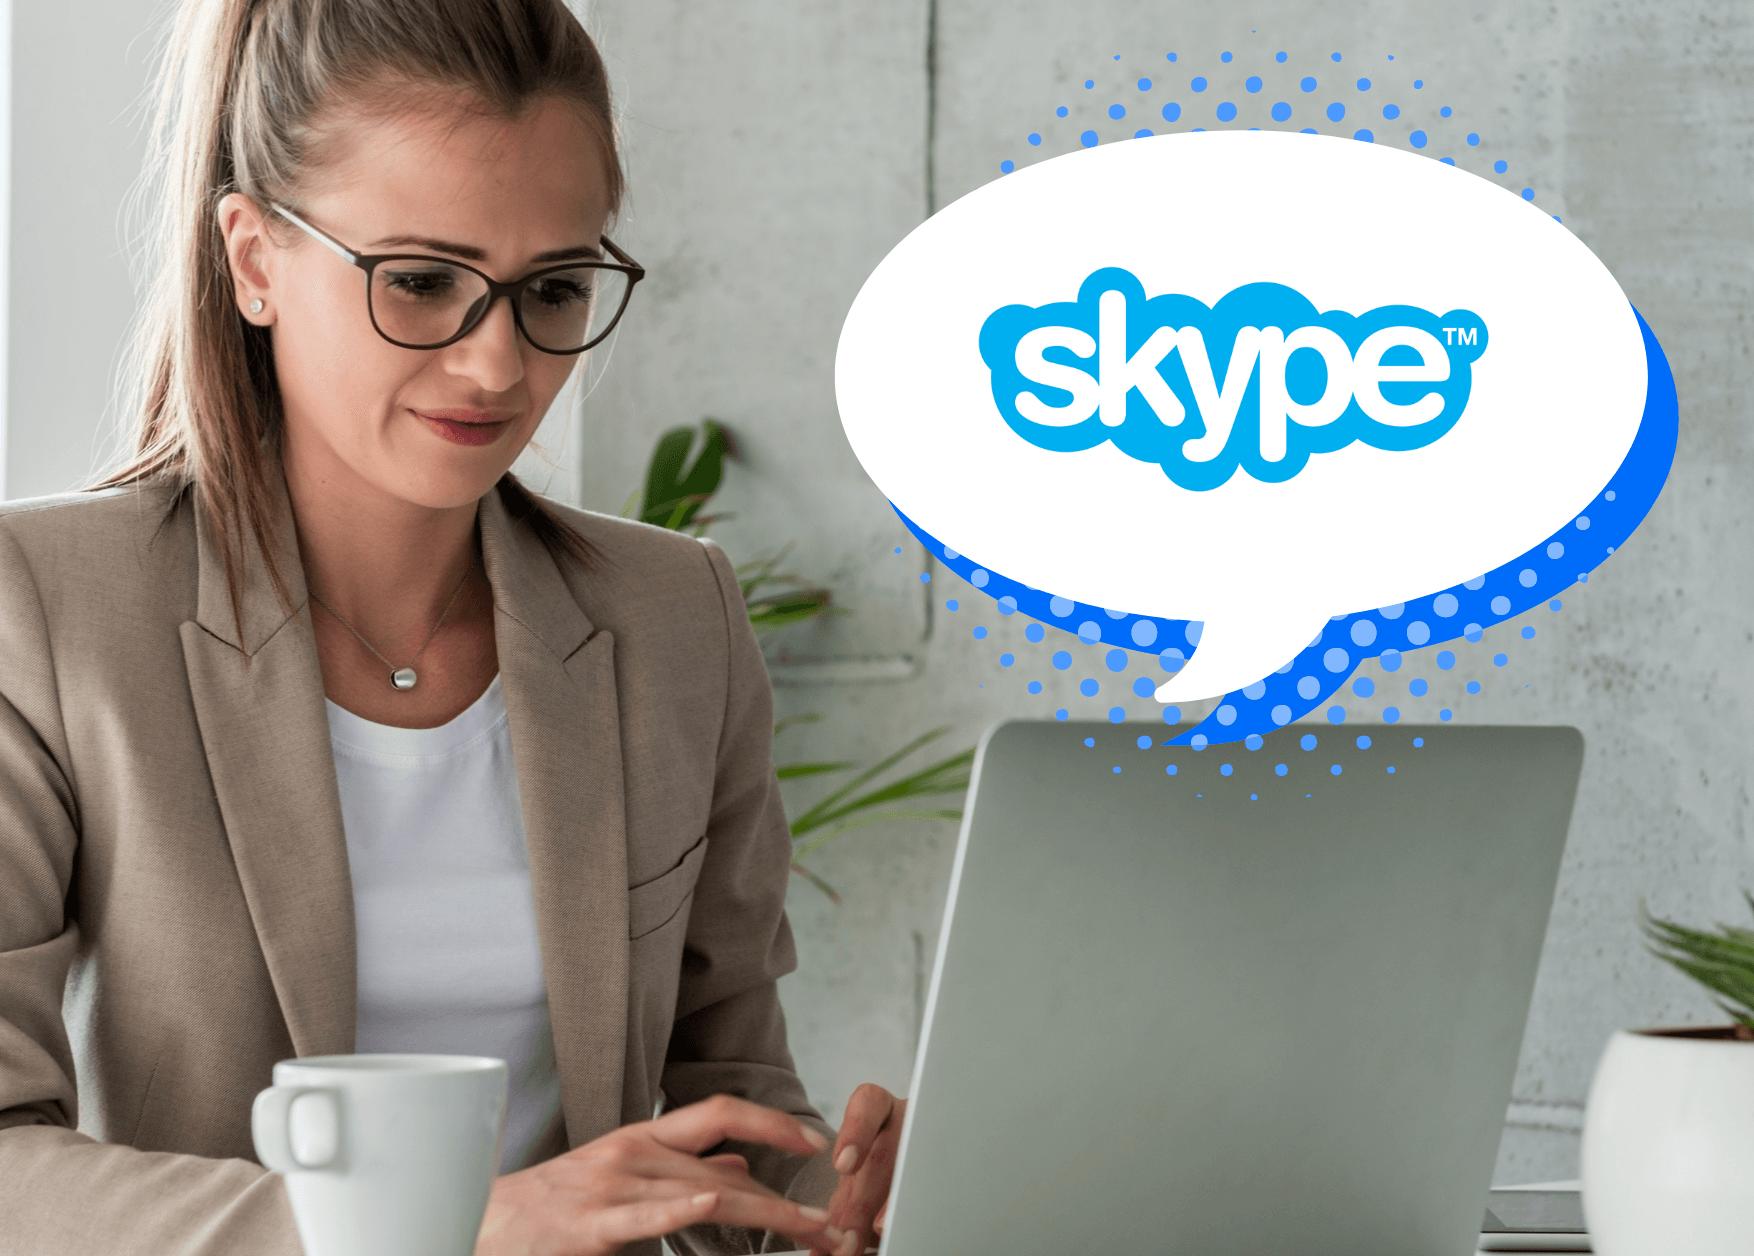 chatbot on skype